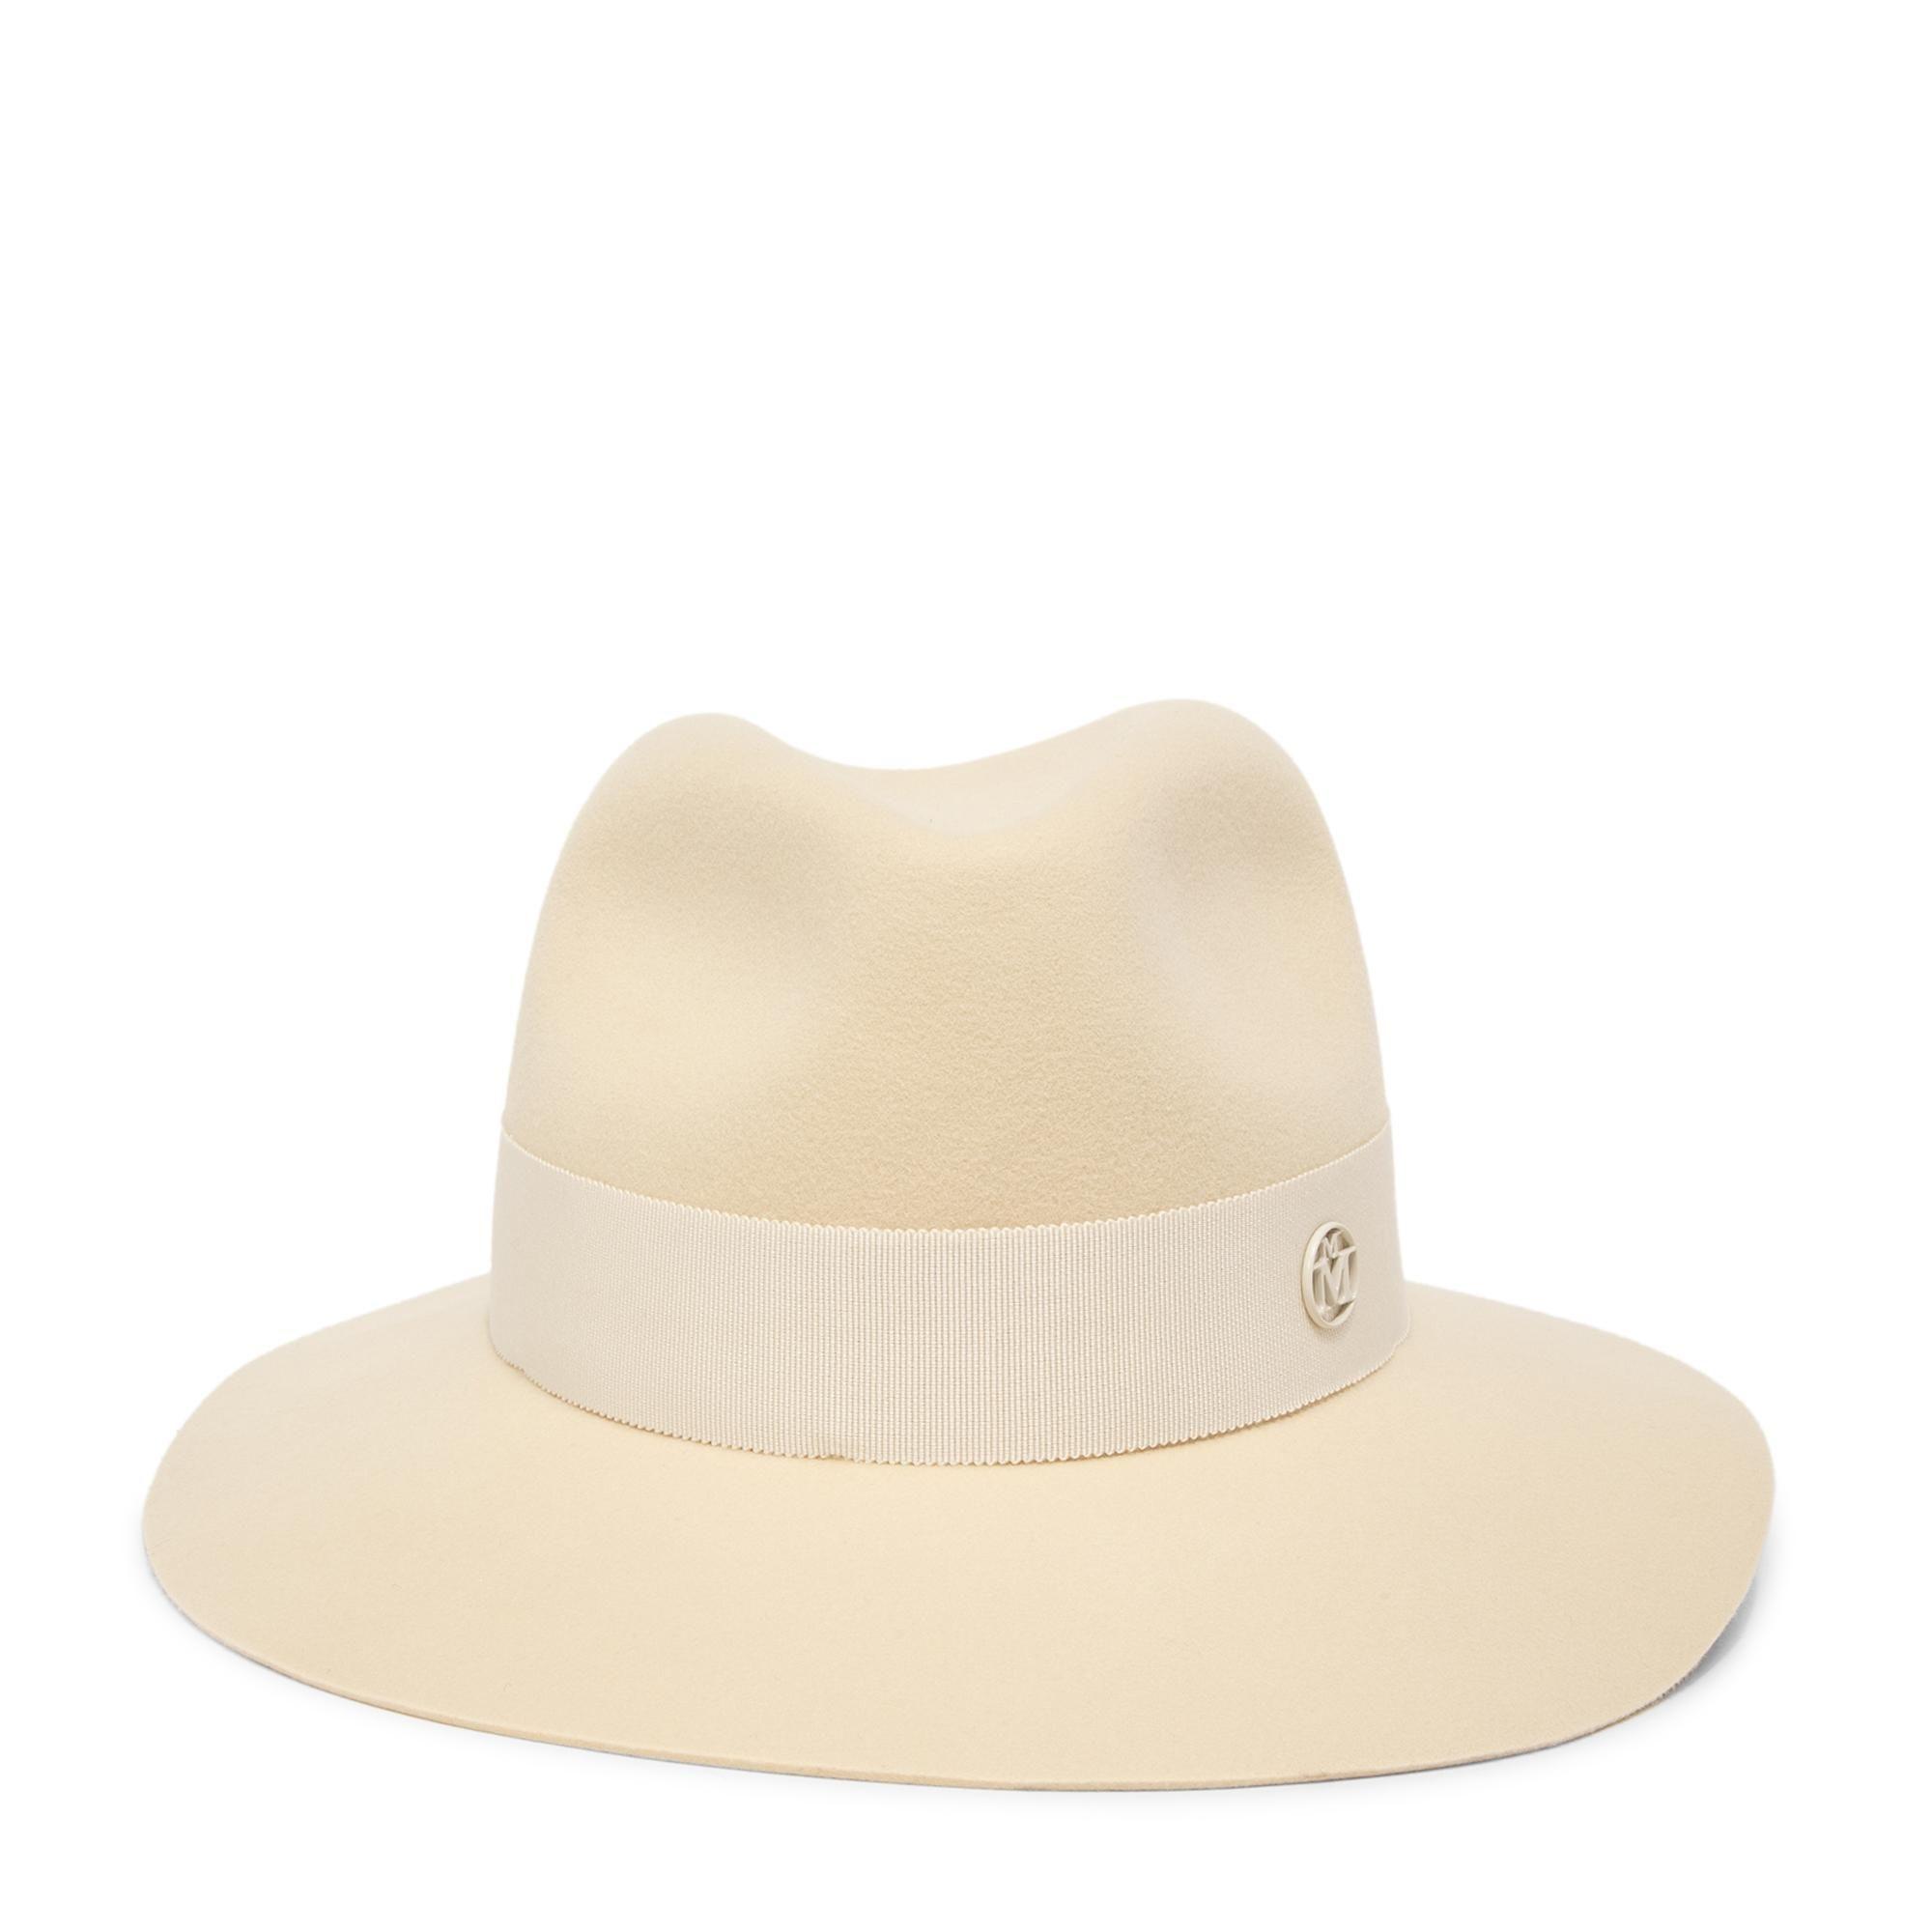 Henrietta wool felt hat